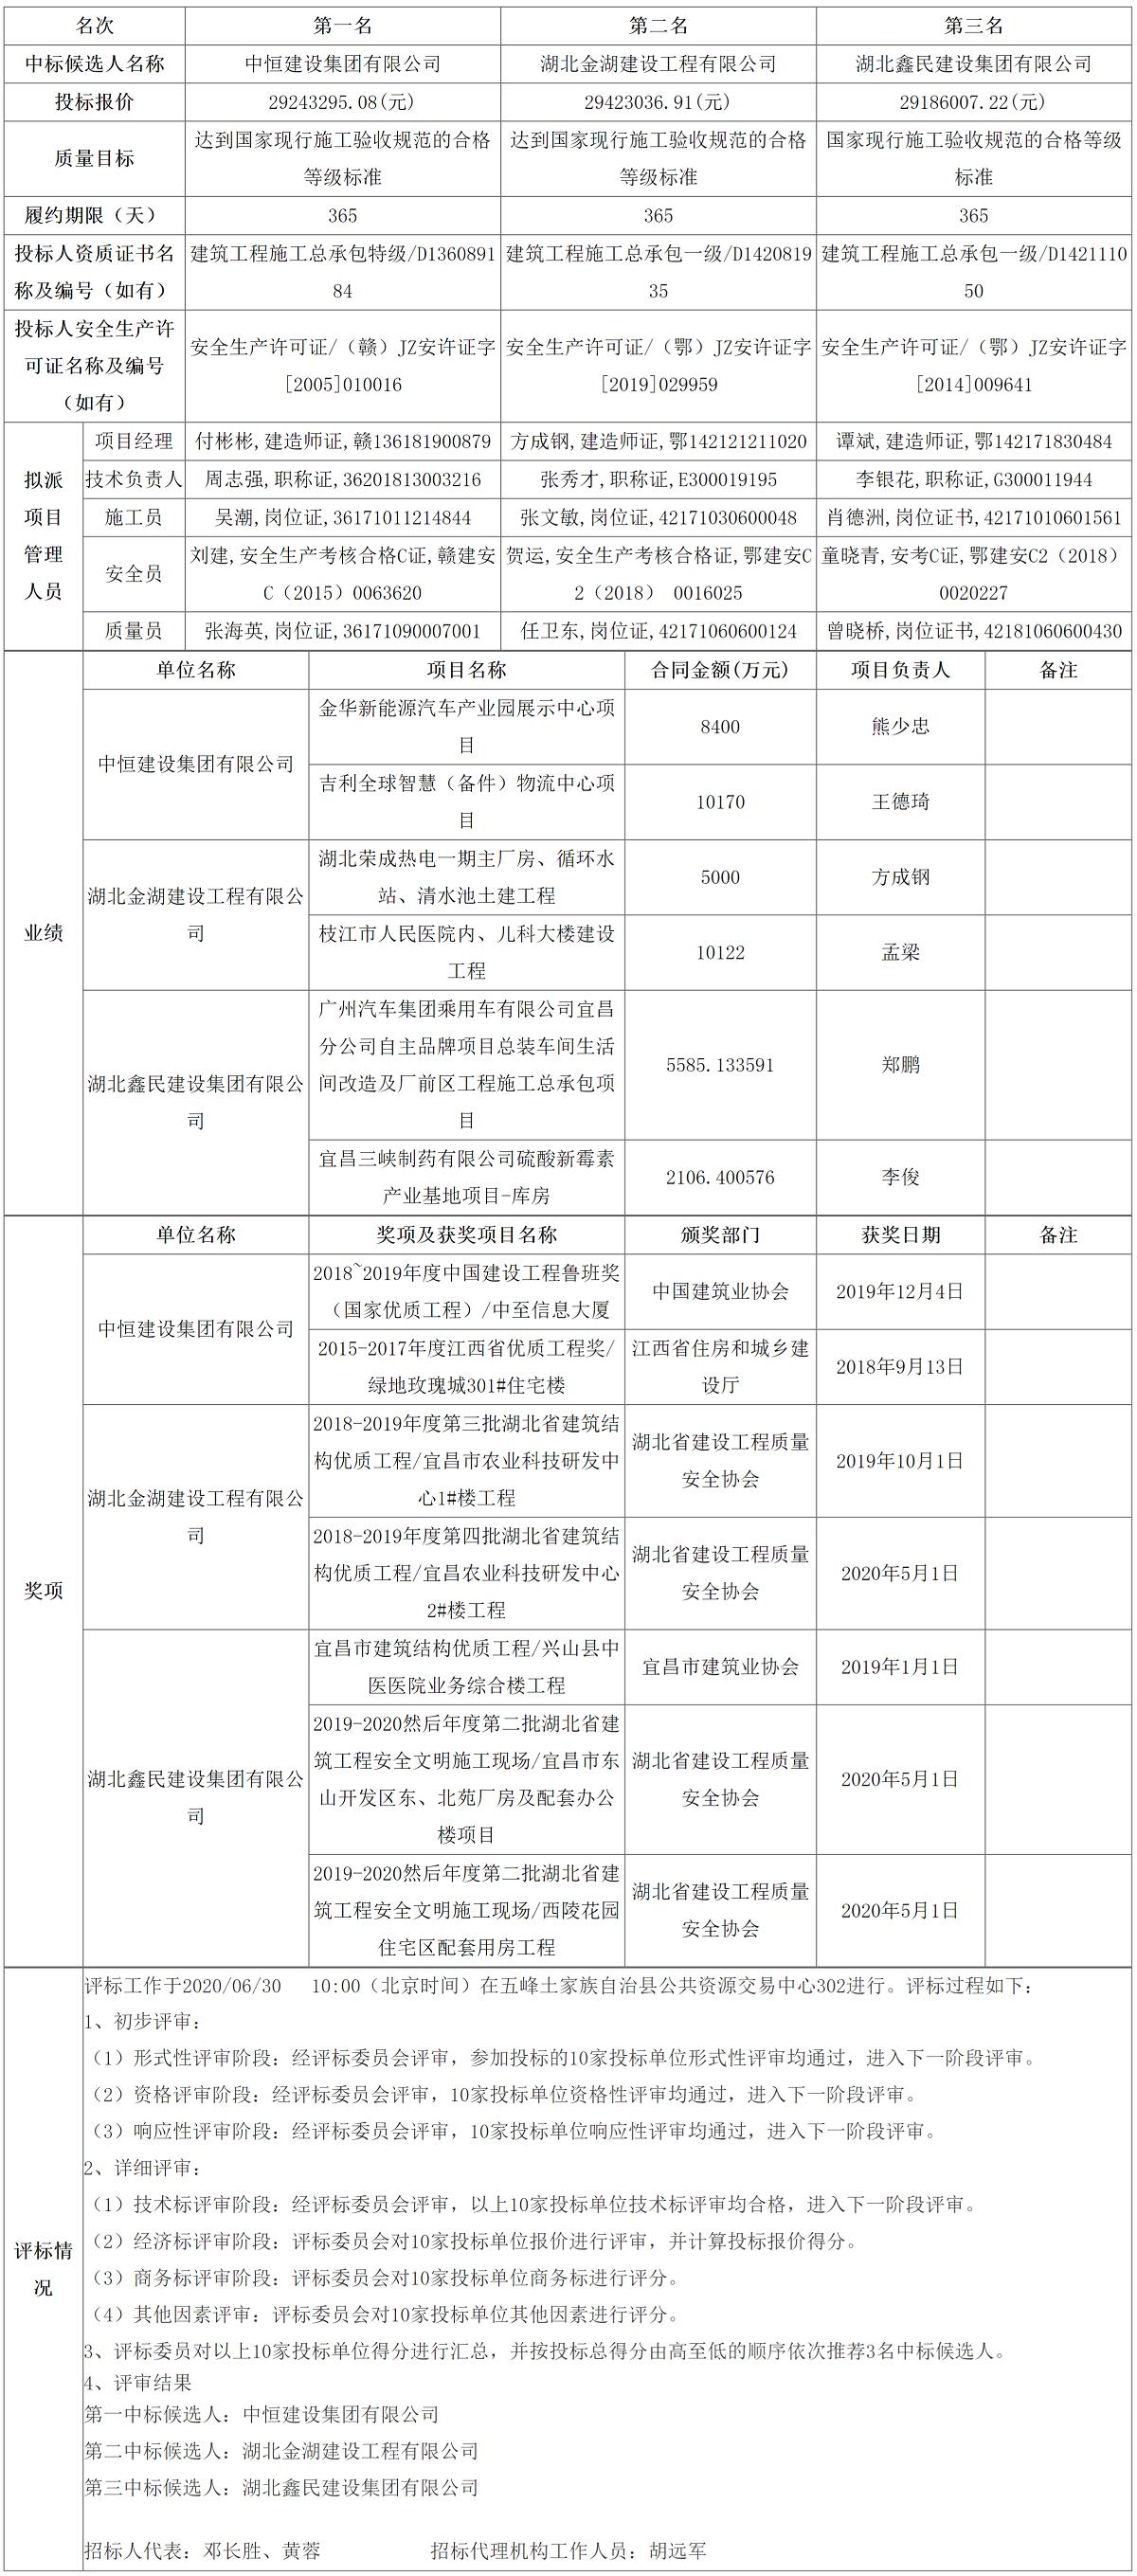 FireShot Capture 025 - 五峰公共資源交易中心 - ggzyjy